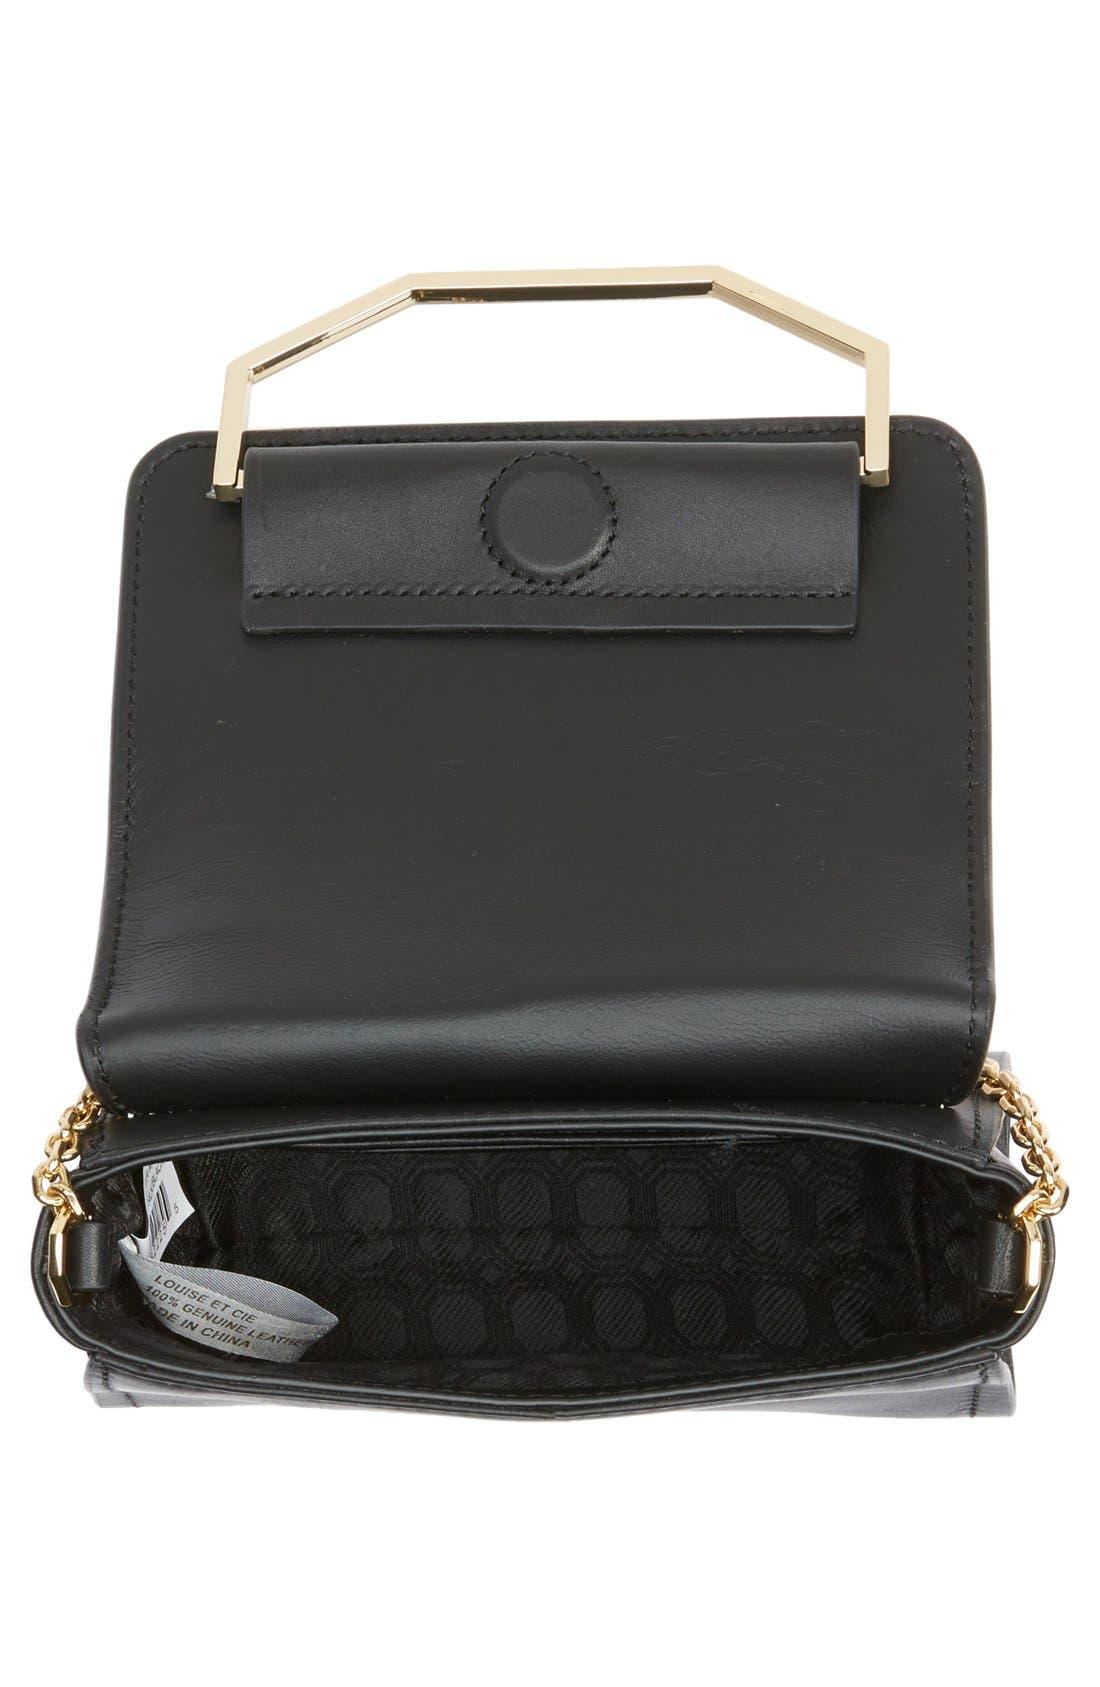 LOUISE ET CIE, 'Towa Micro' Colorblock Leather Bag, Alternate thumbnail 3, color, 100